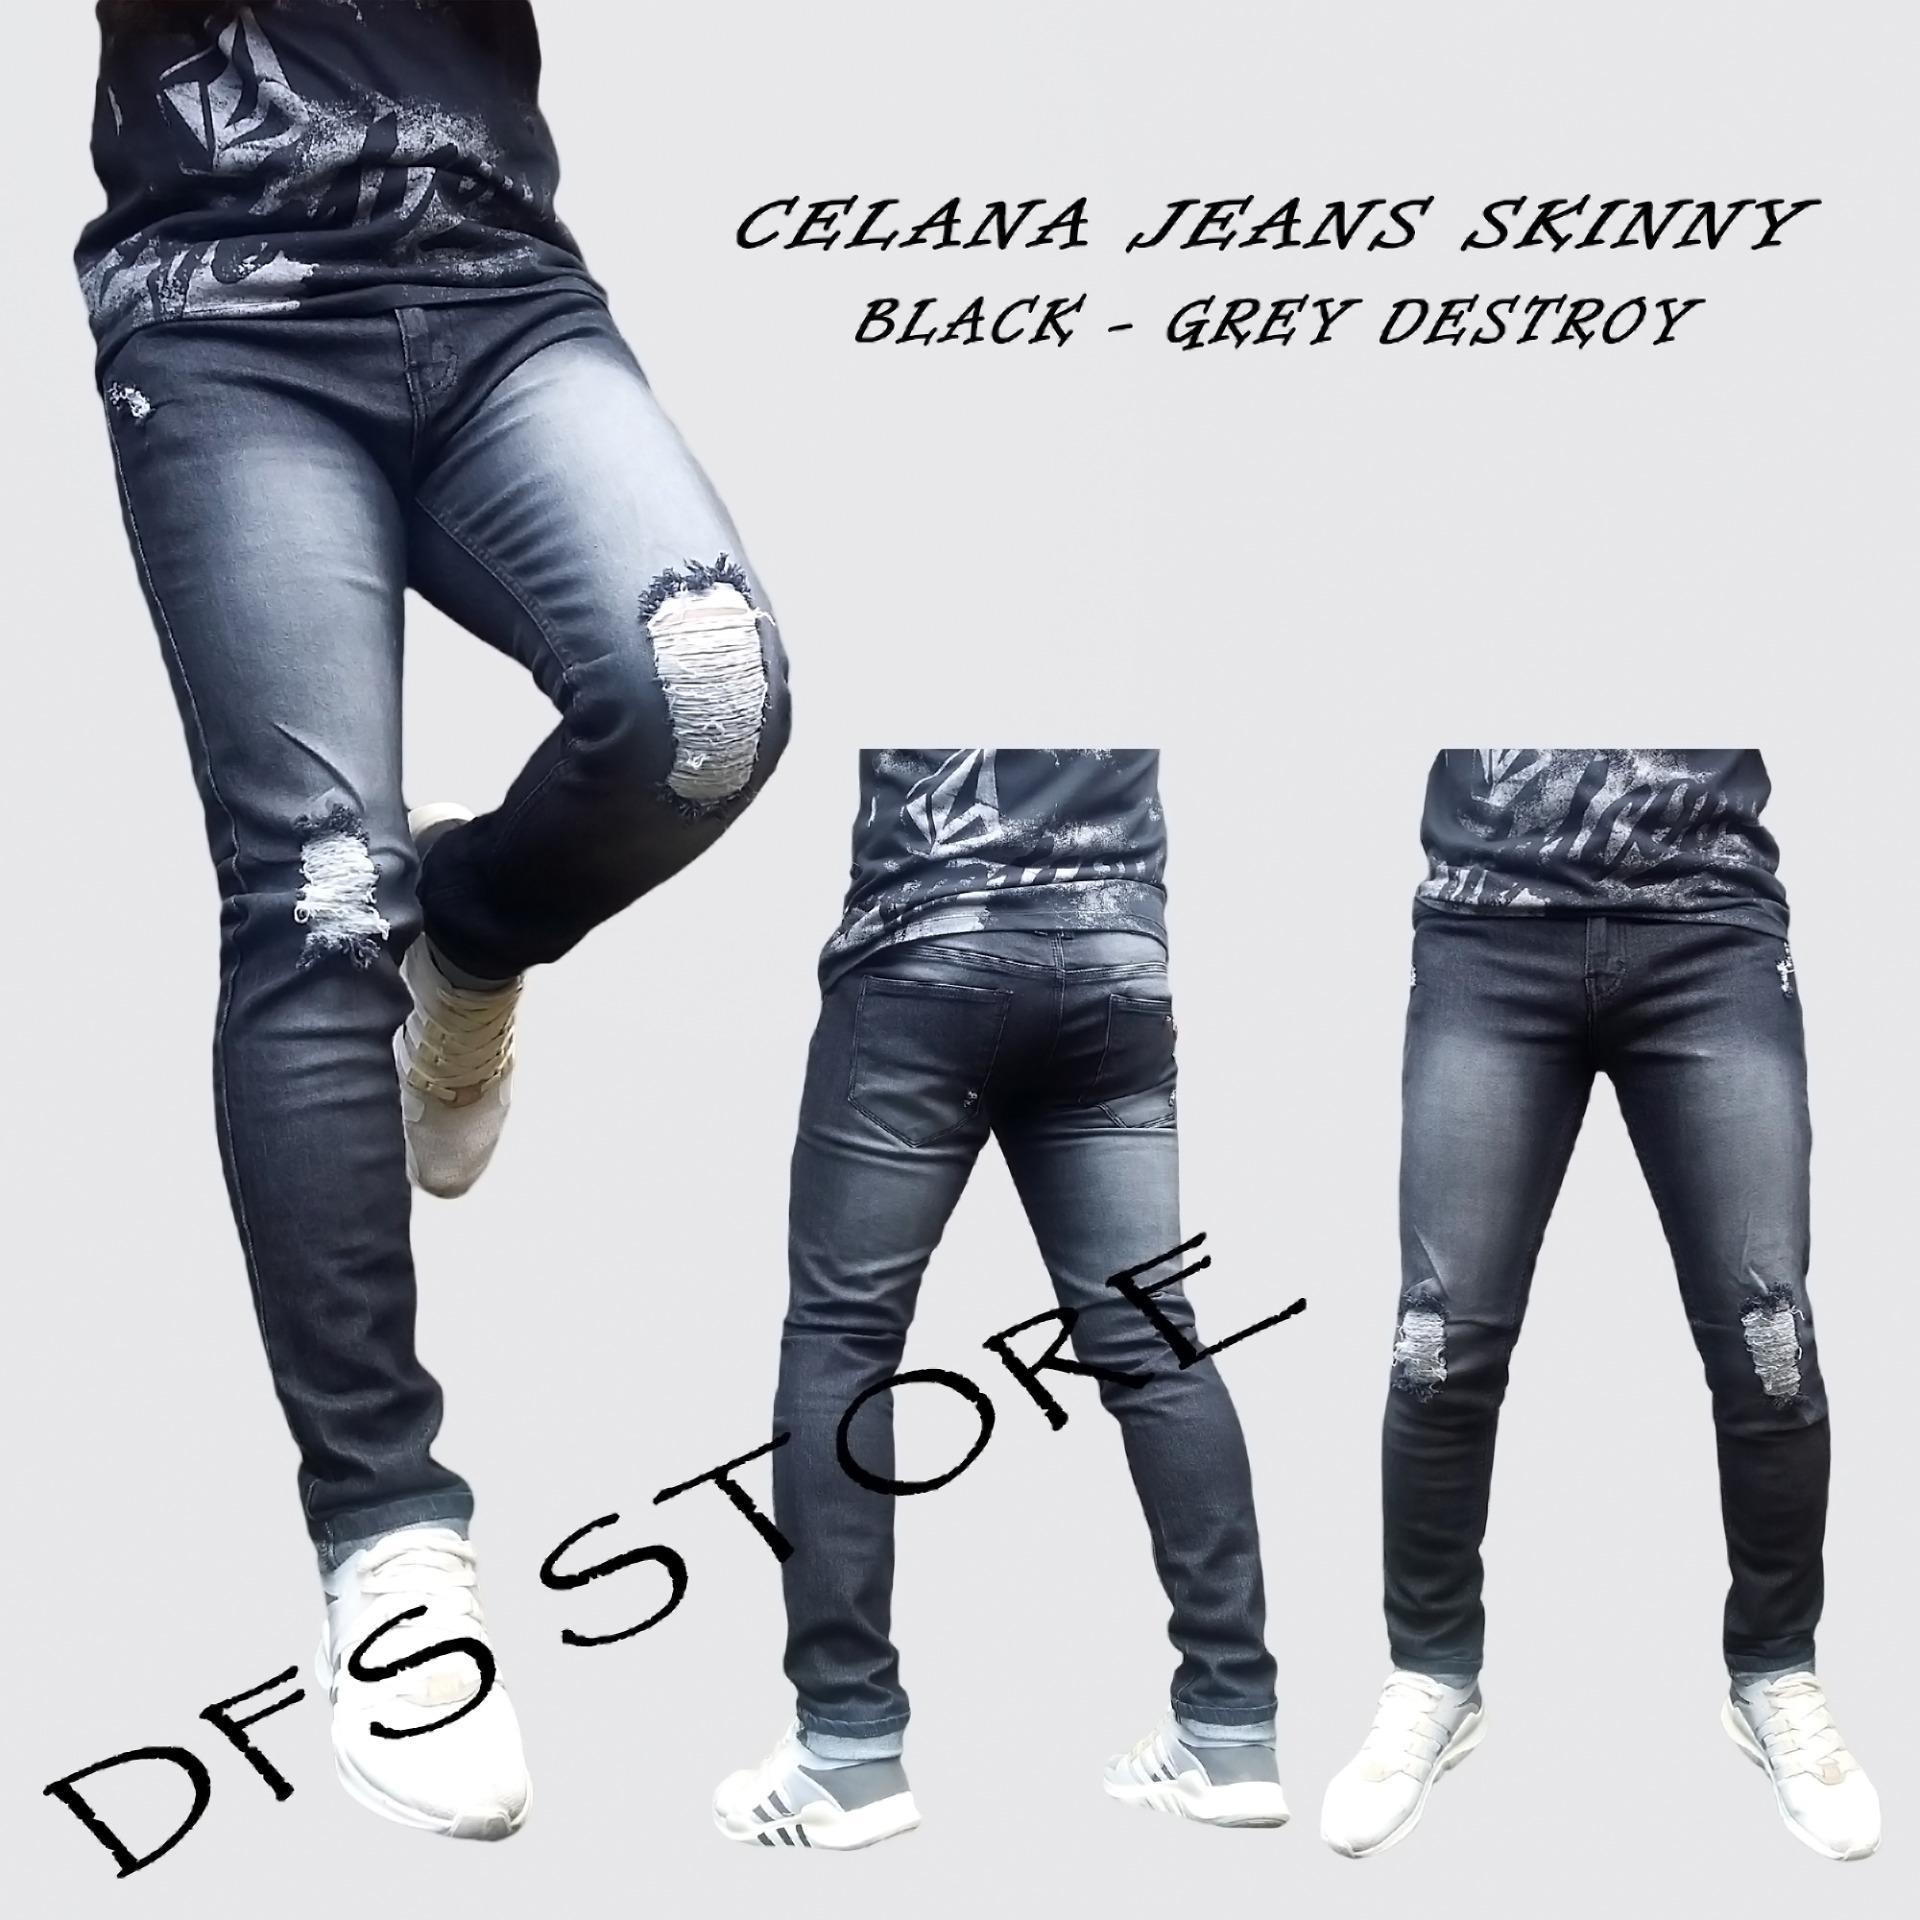 Harga Penawaran Dfs Celana Jeans Skinny Slimfit Pensil Pria Bg Formal Chino Wool Black Scrub Destroy